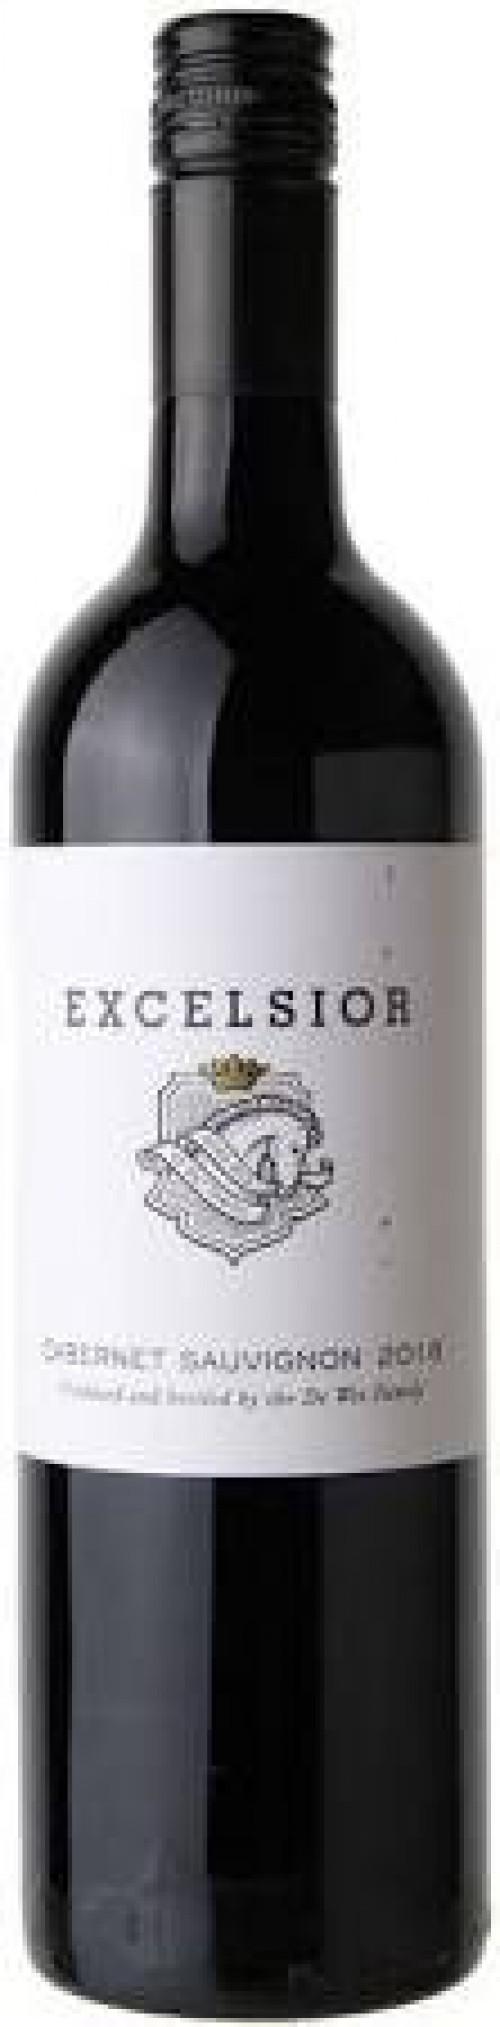 Excelsior Cabernet Sauvignon 750ml